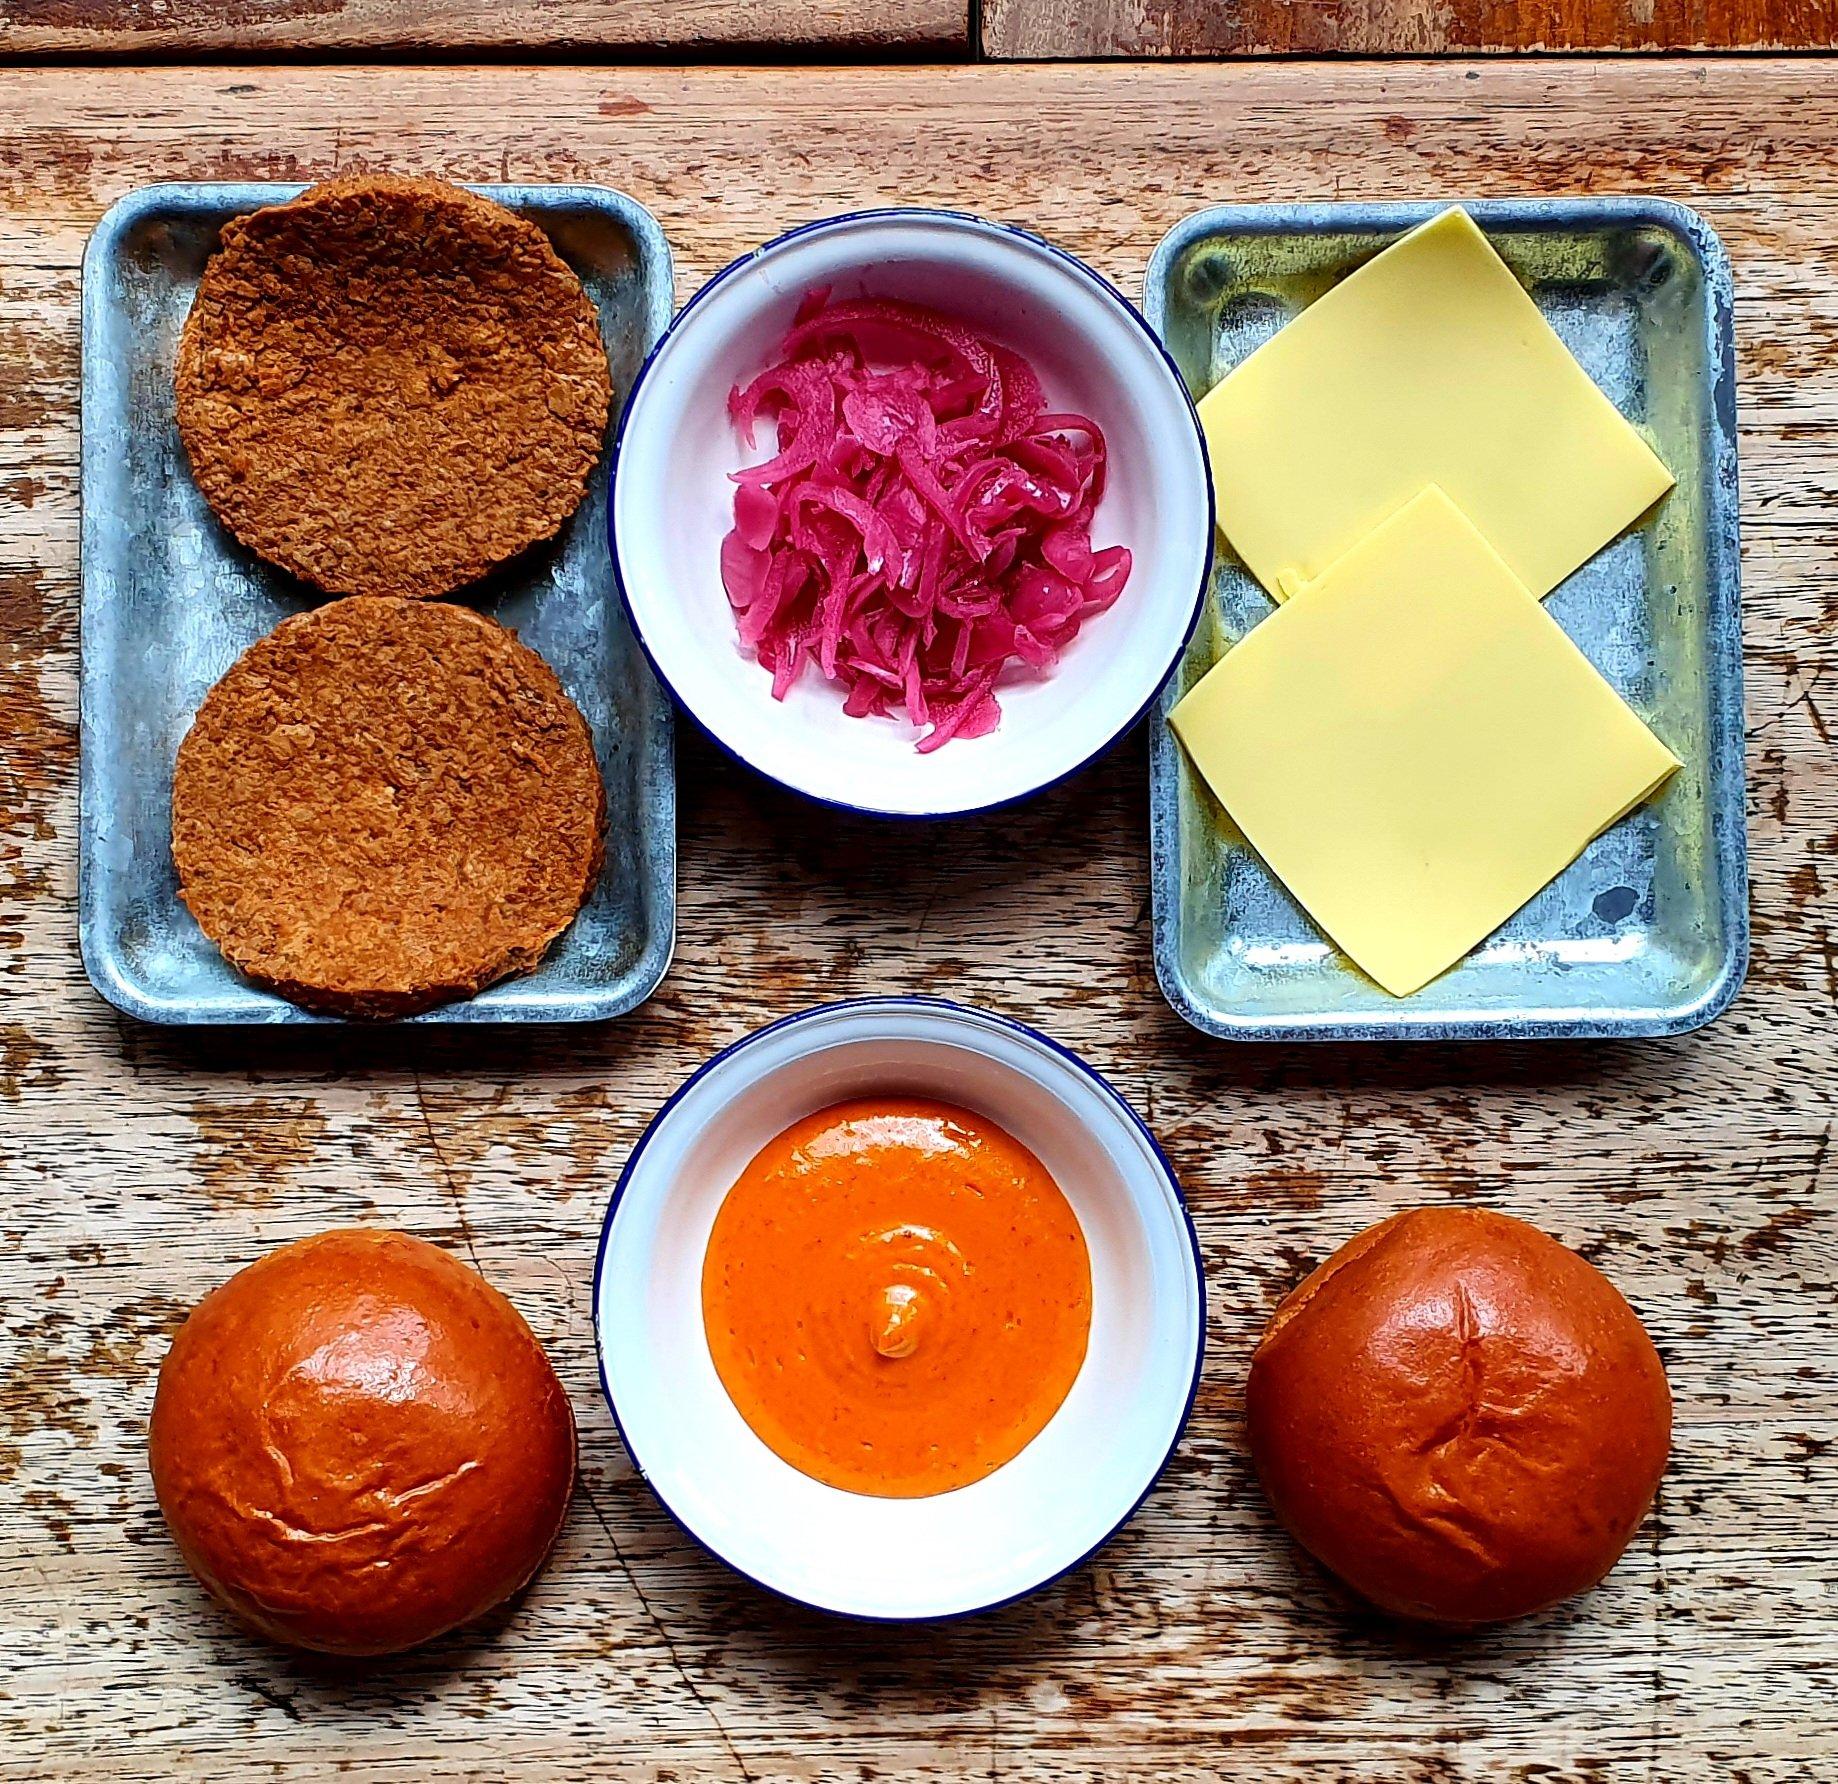 Vegan 'Ari Gold' Burger Kit